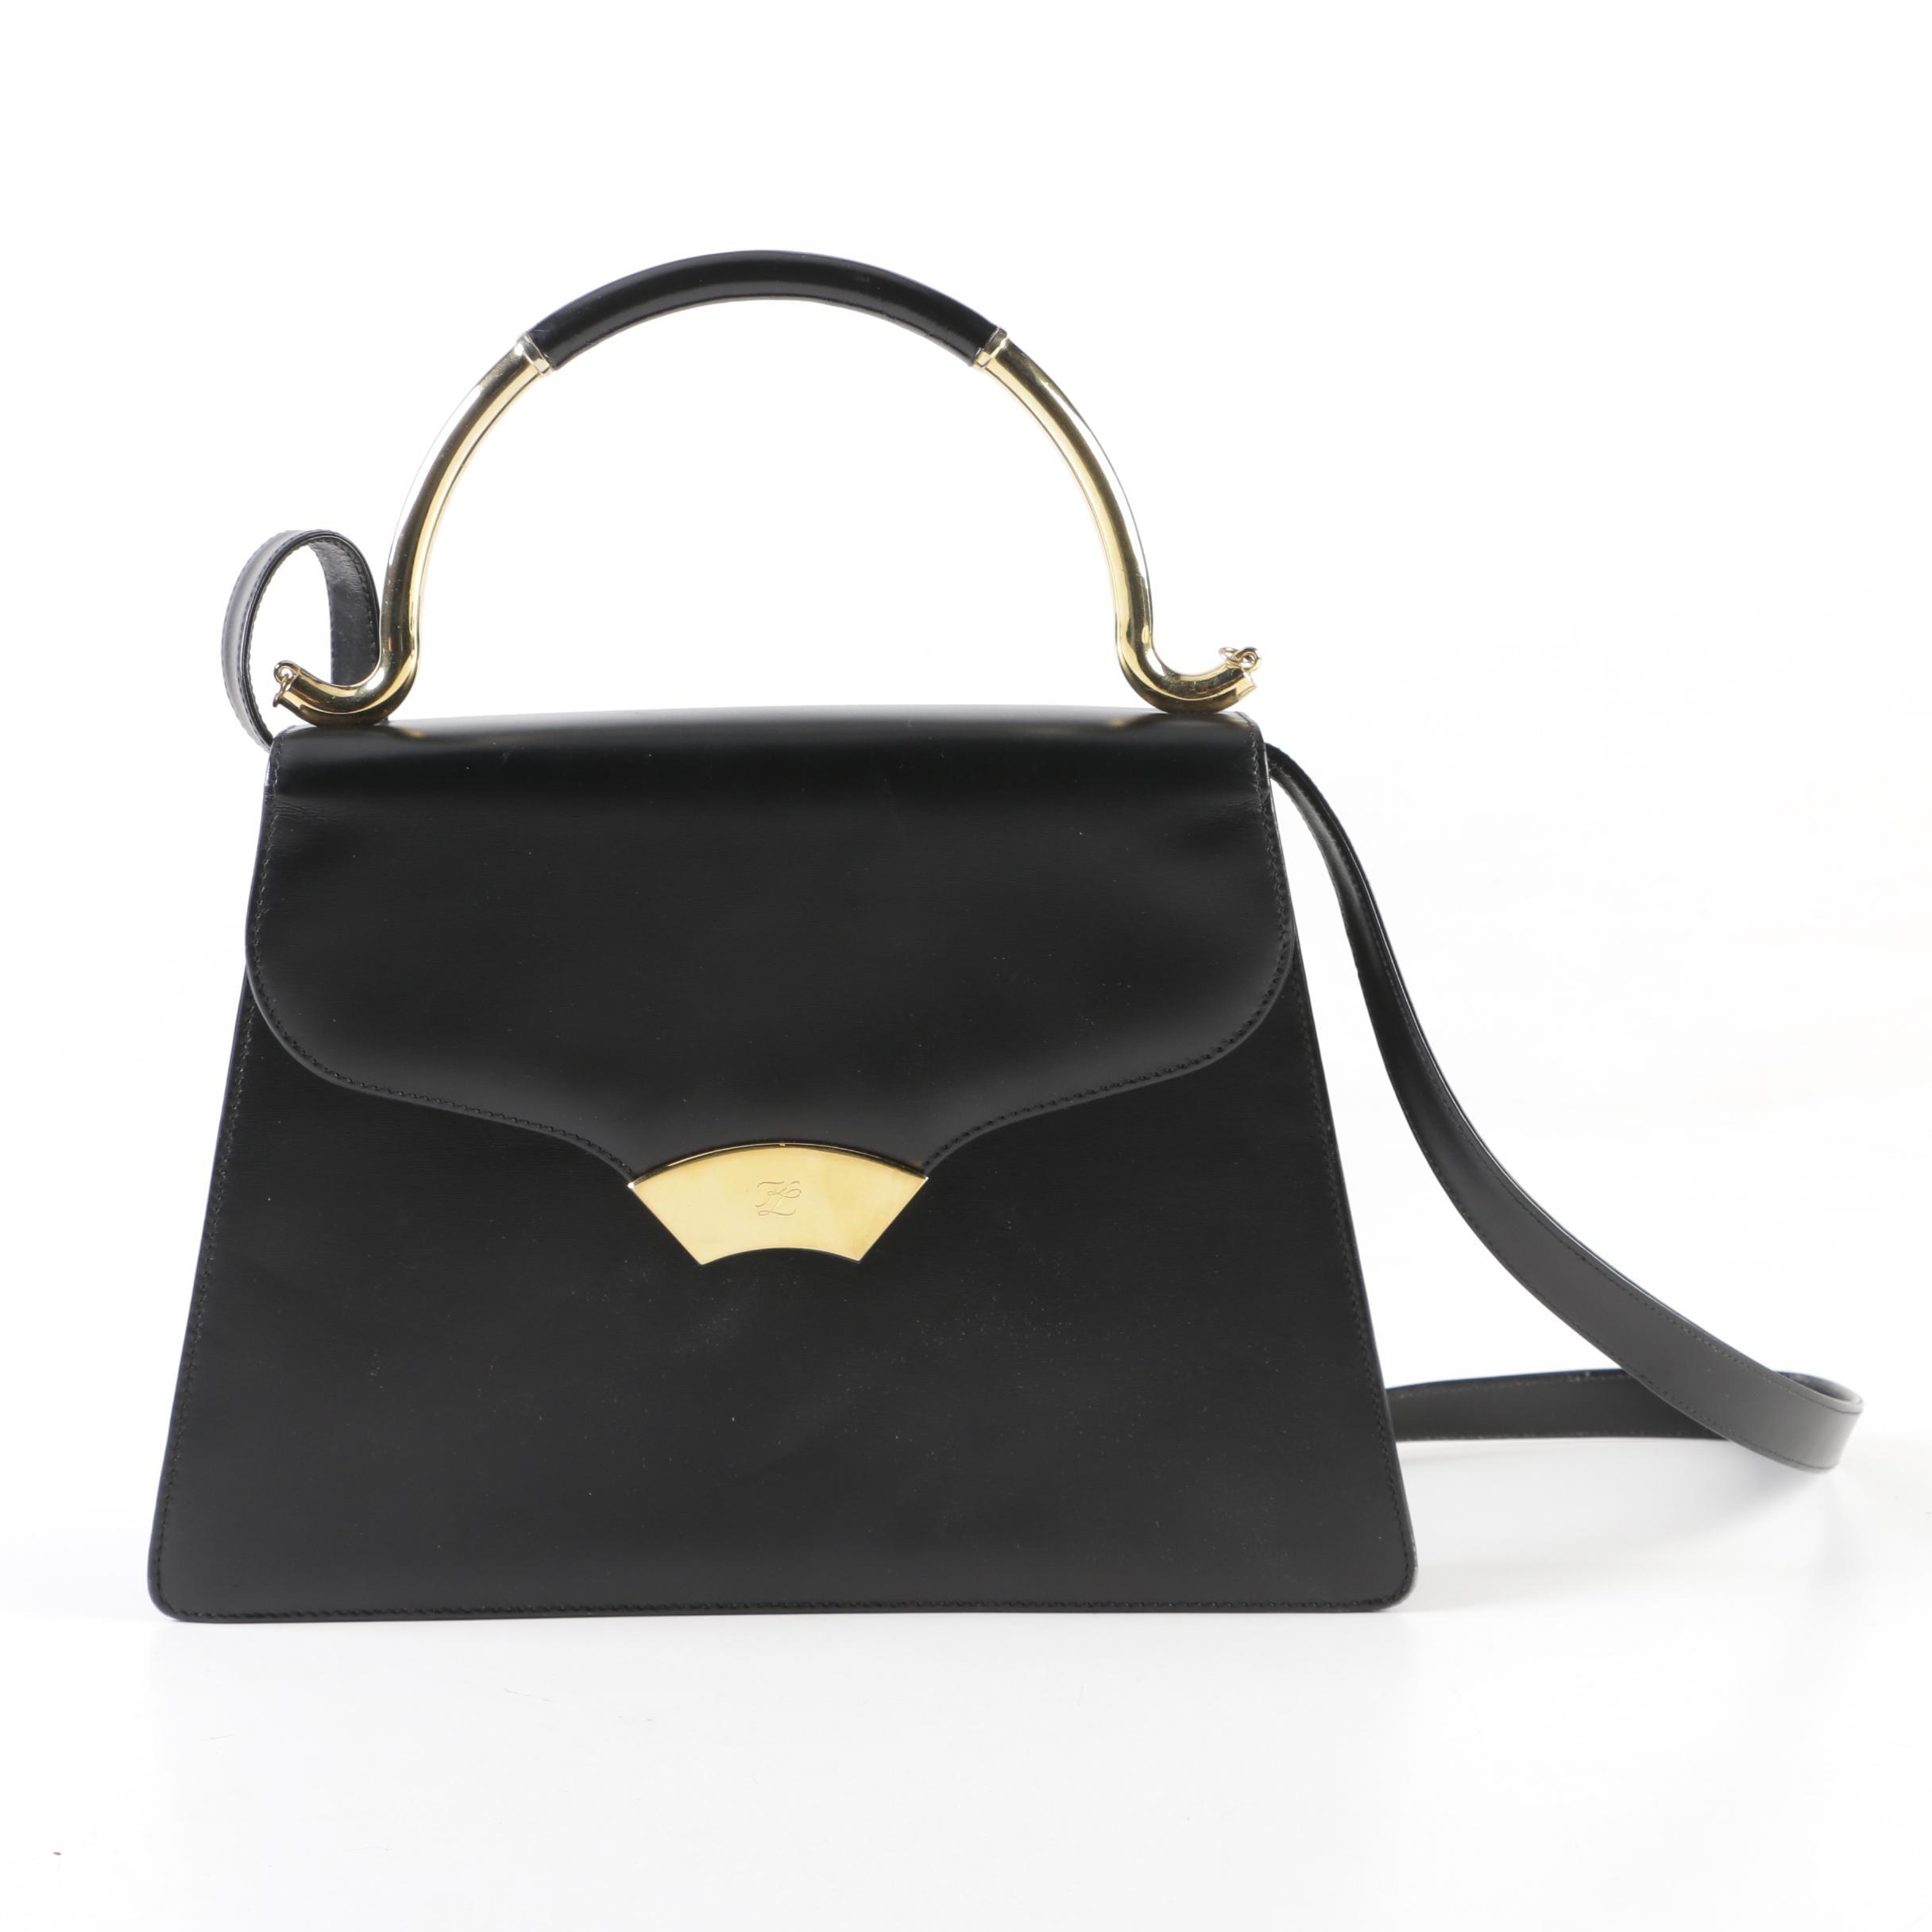 Karl Lagerfeld of Paris Black Leather Top Handle Handbag with Shoulder Strap